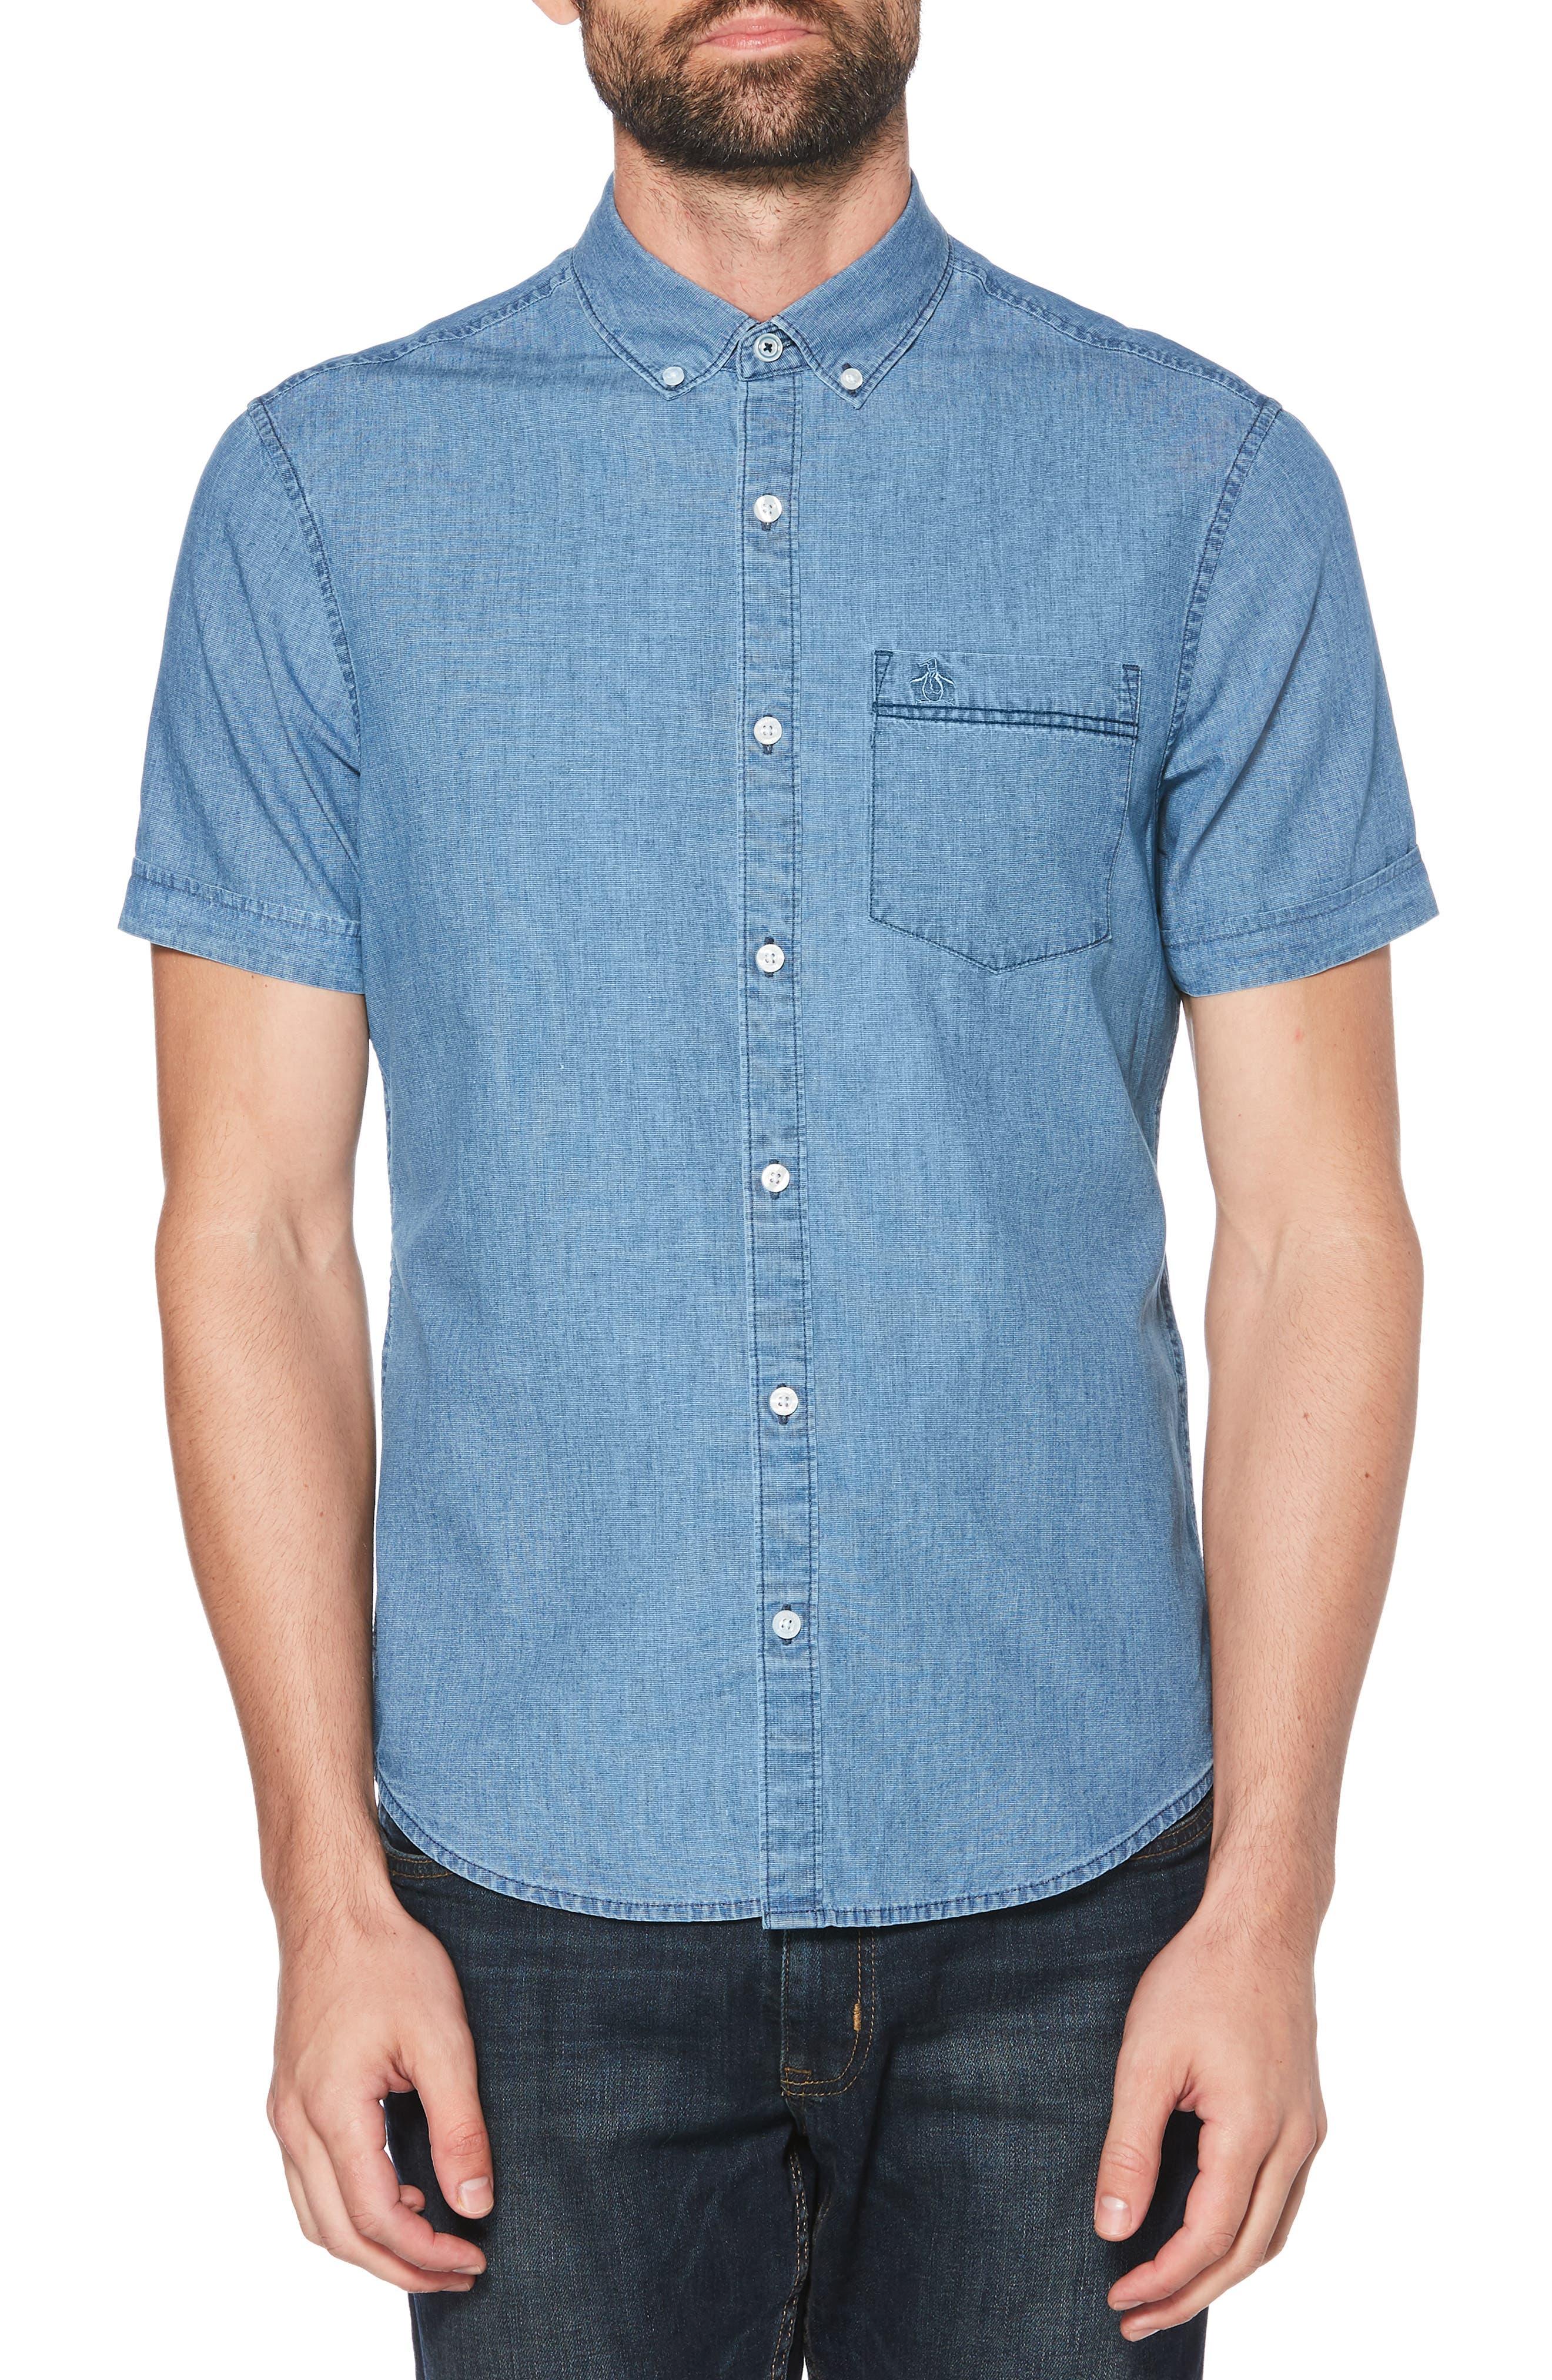 ORIGINAL PENGUIN Pinpoint Slim Fit Chambray Shirt, Main, color, 489